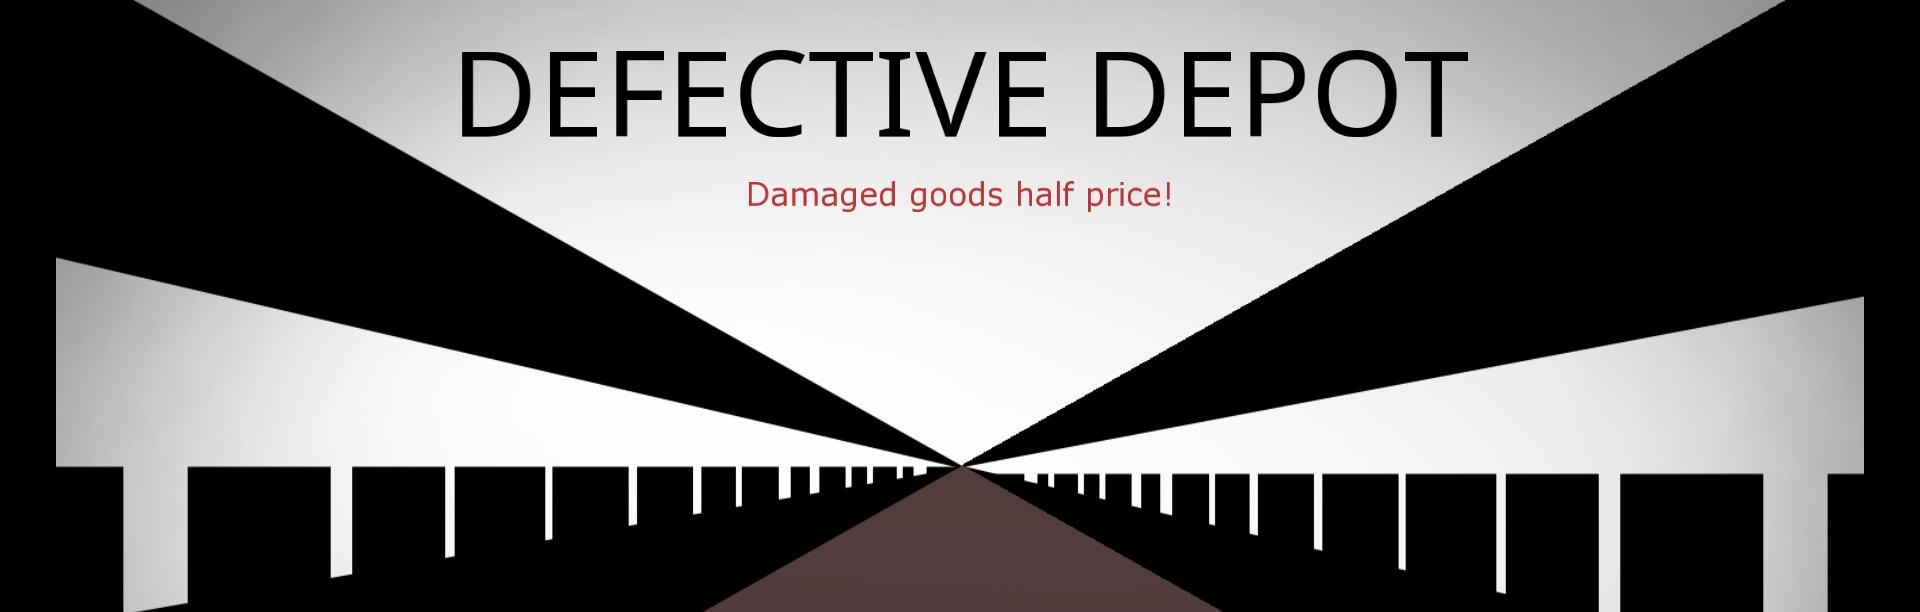 Defective Depot